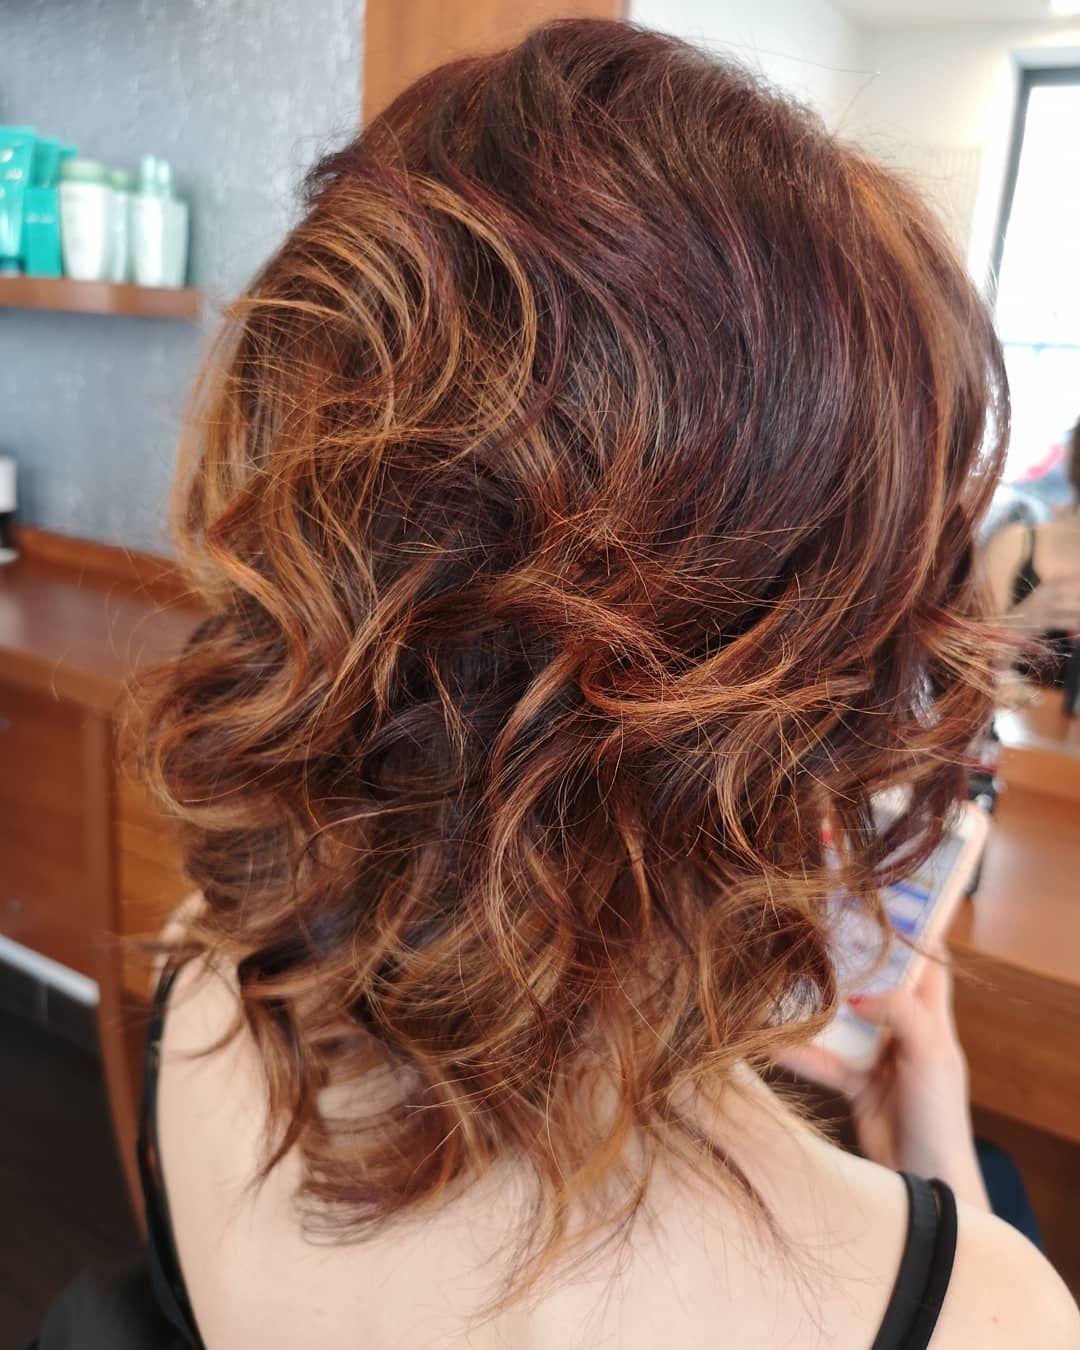 17+ Salon de coiffure lorient inspiration